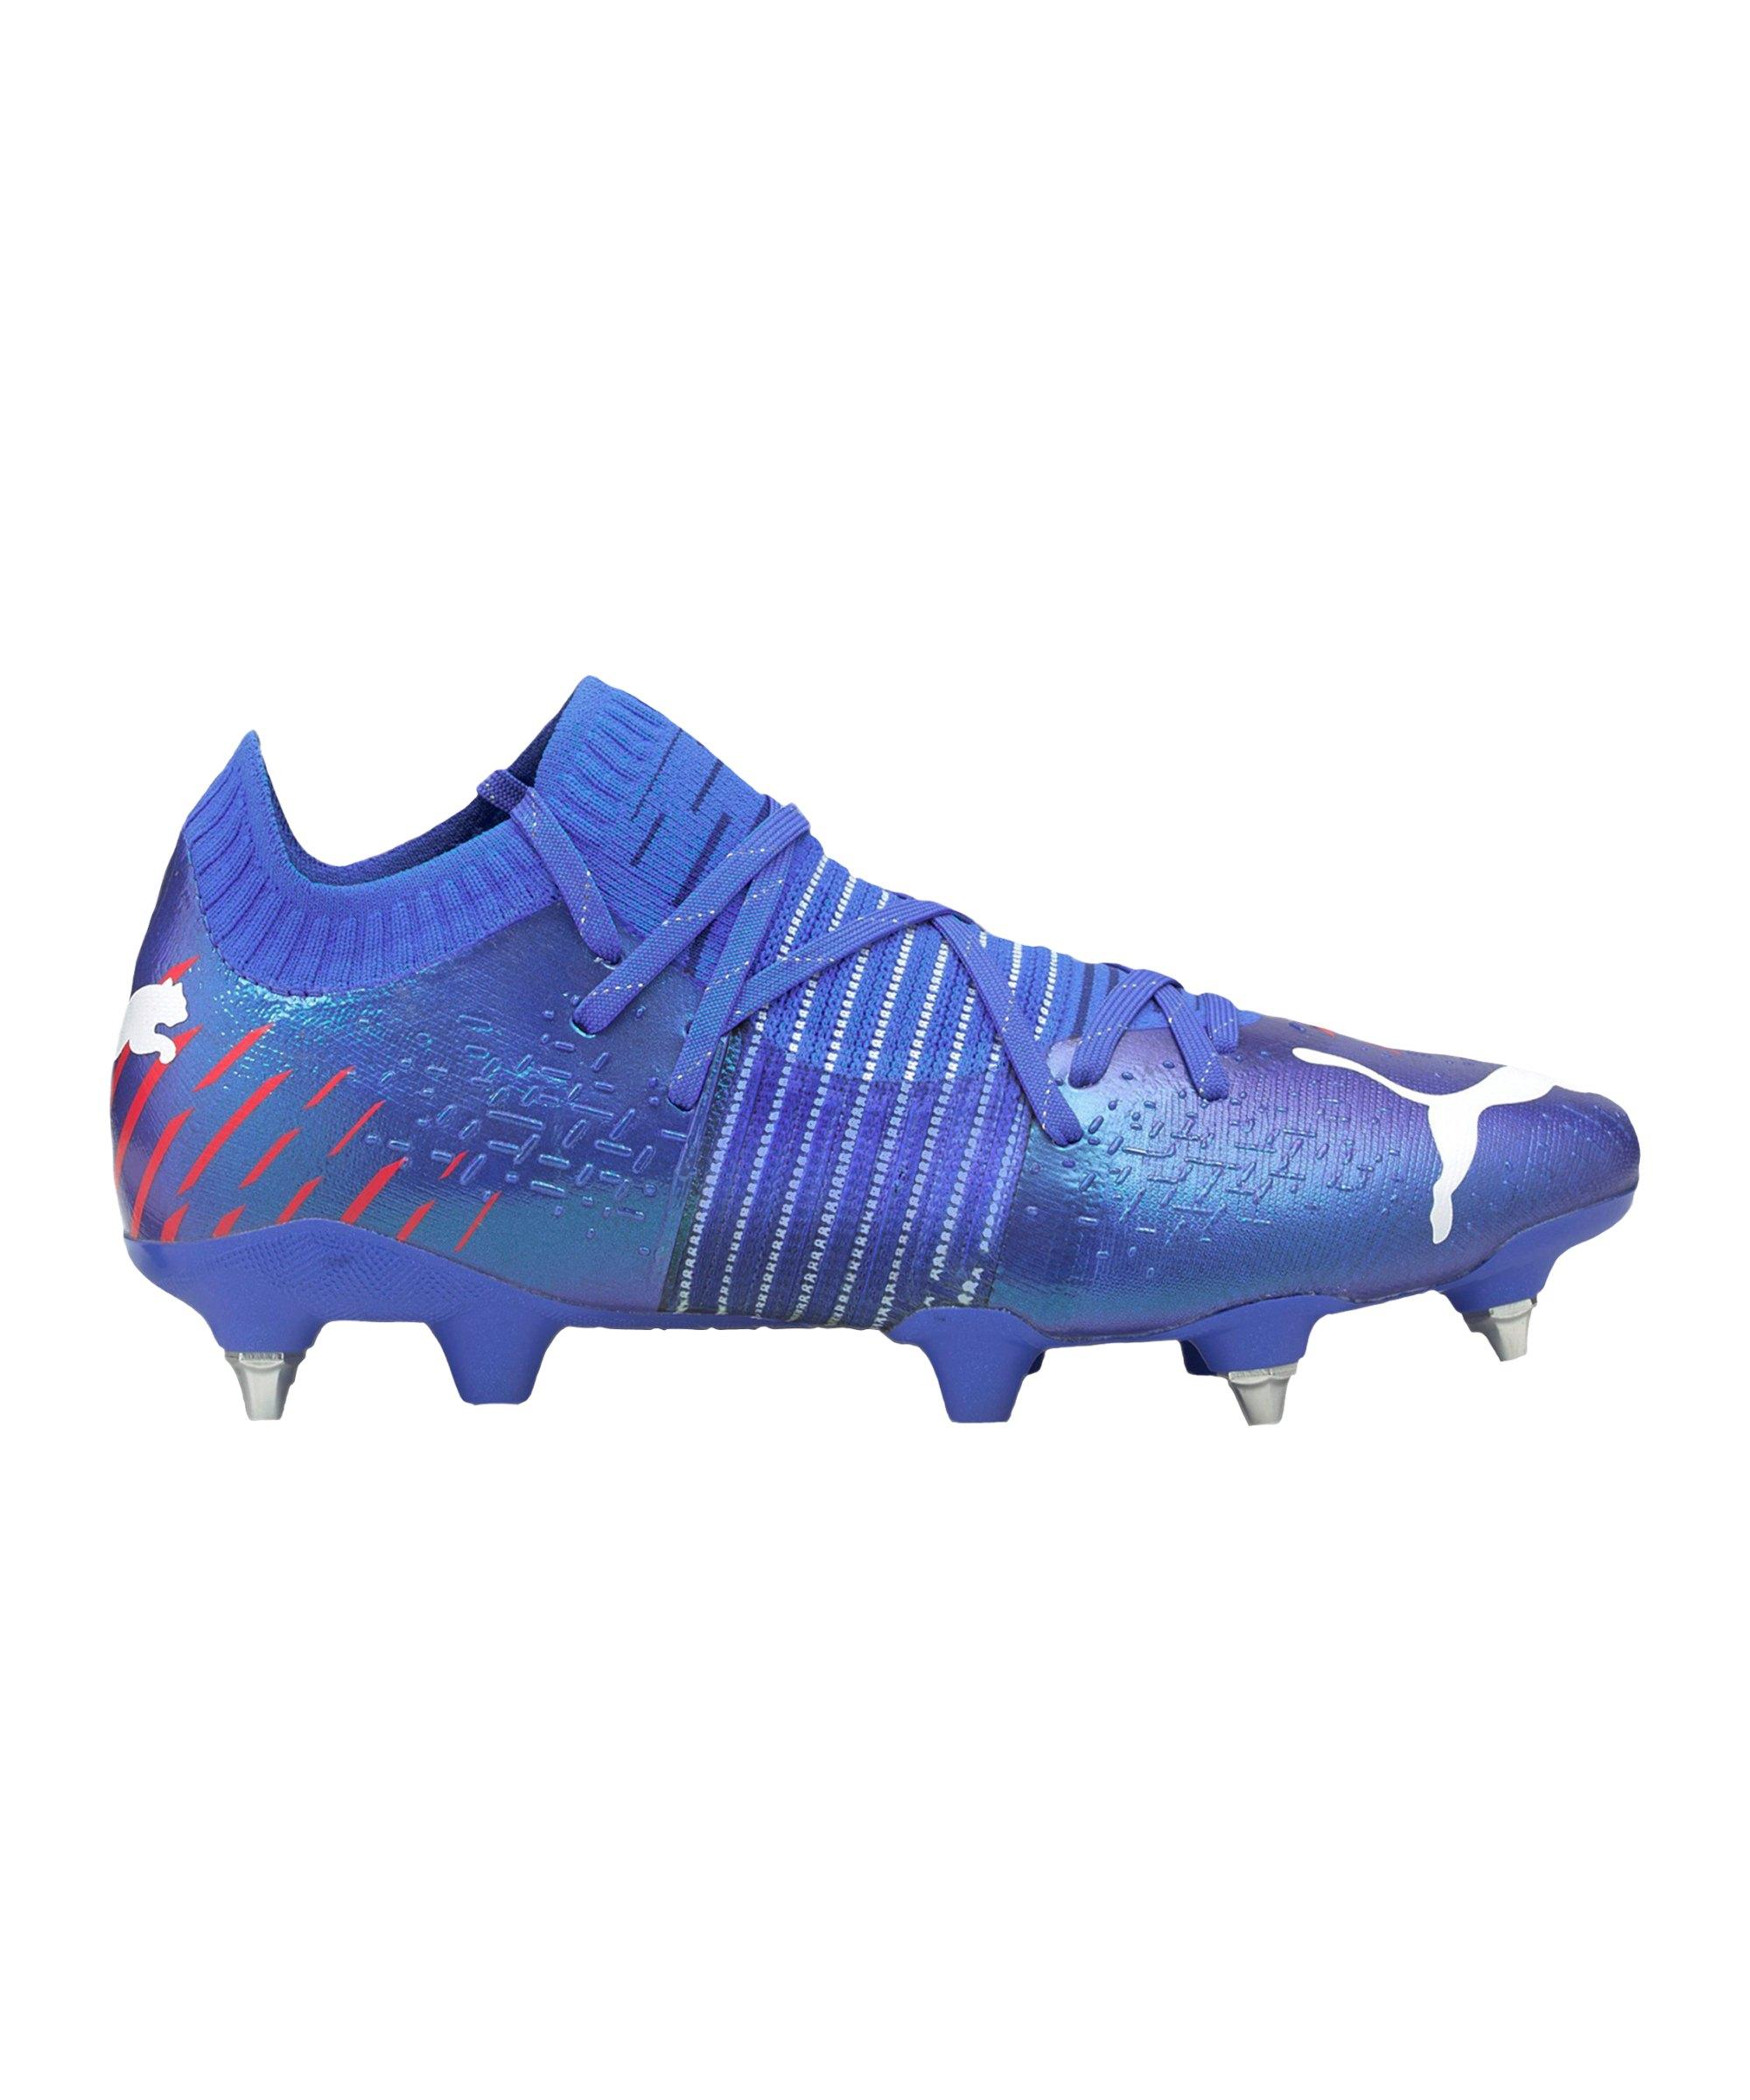 PUMA FUTURE Z 1.2 Faster Football MxSG Blau Rot F01 - blau